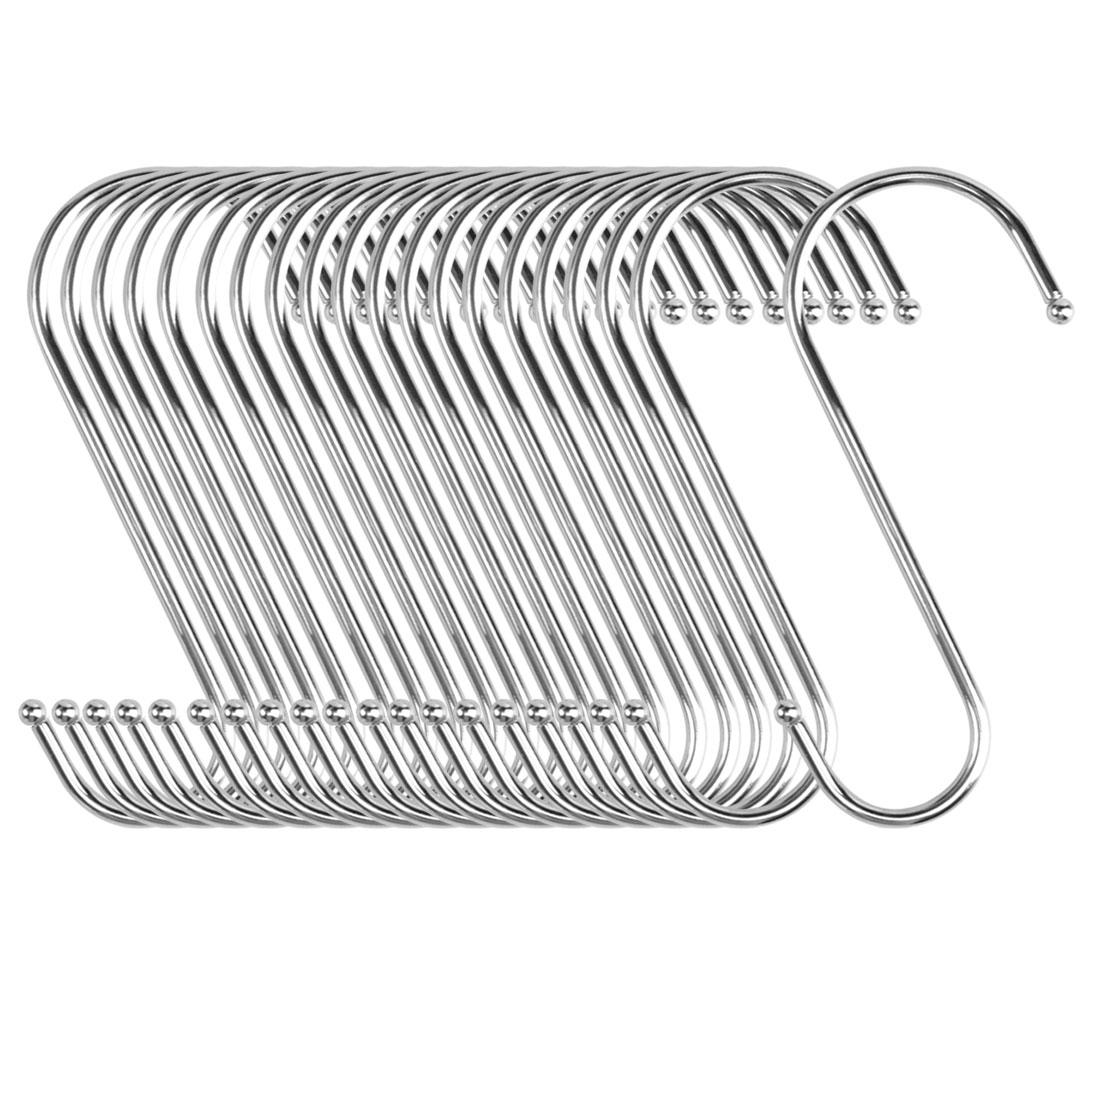 20pcs S Shaped Hook Stainless Steel Kitchenware Hat Utensil Pot Holder